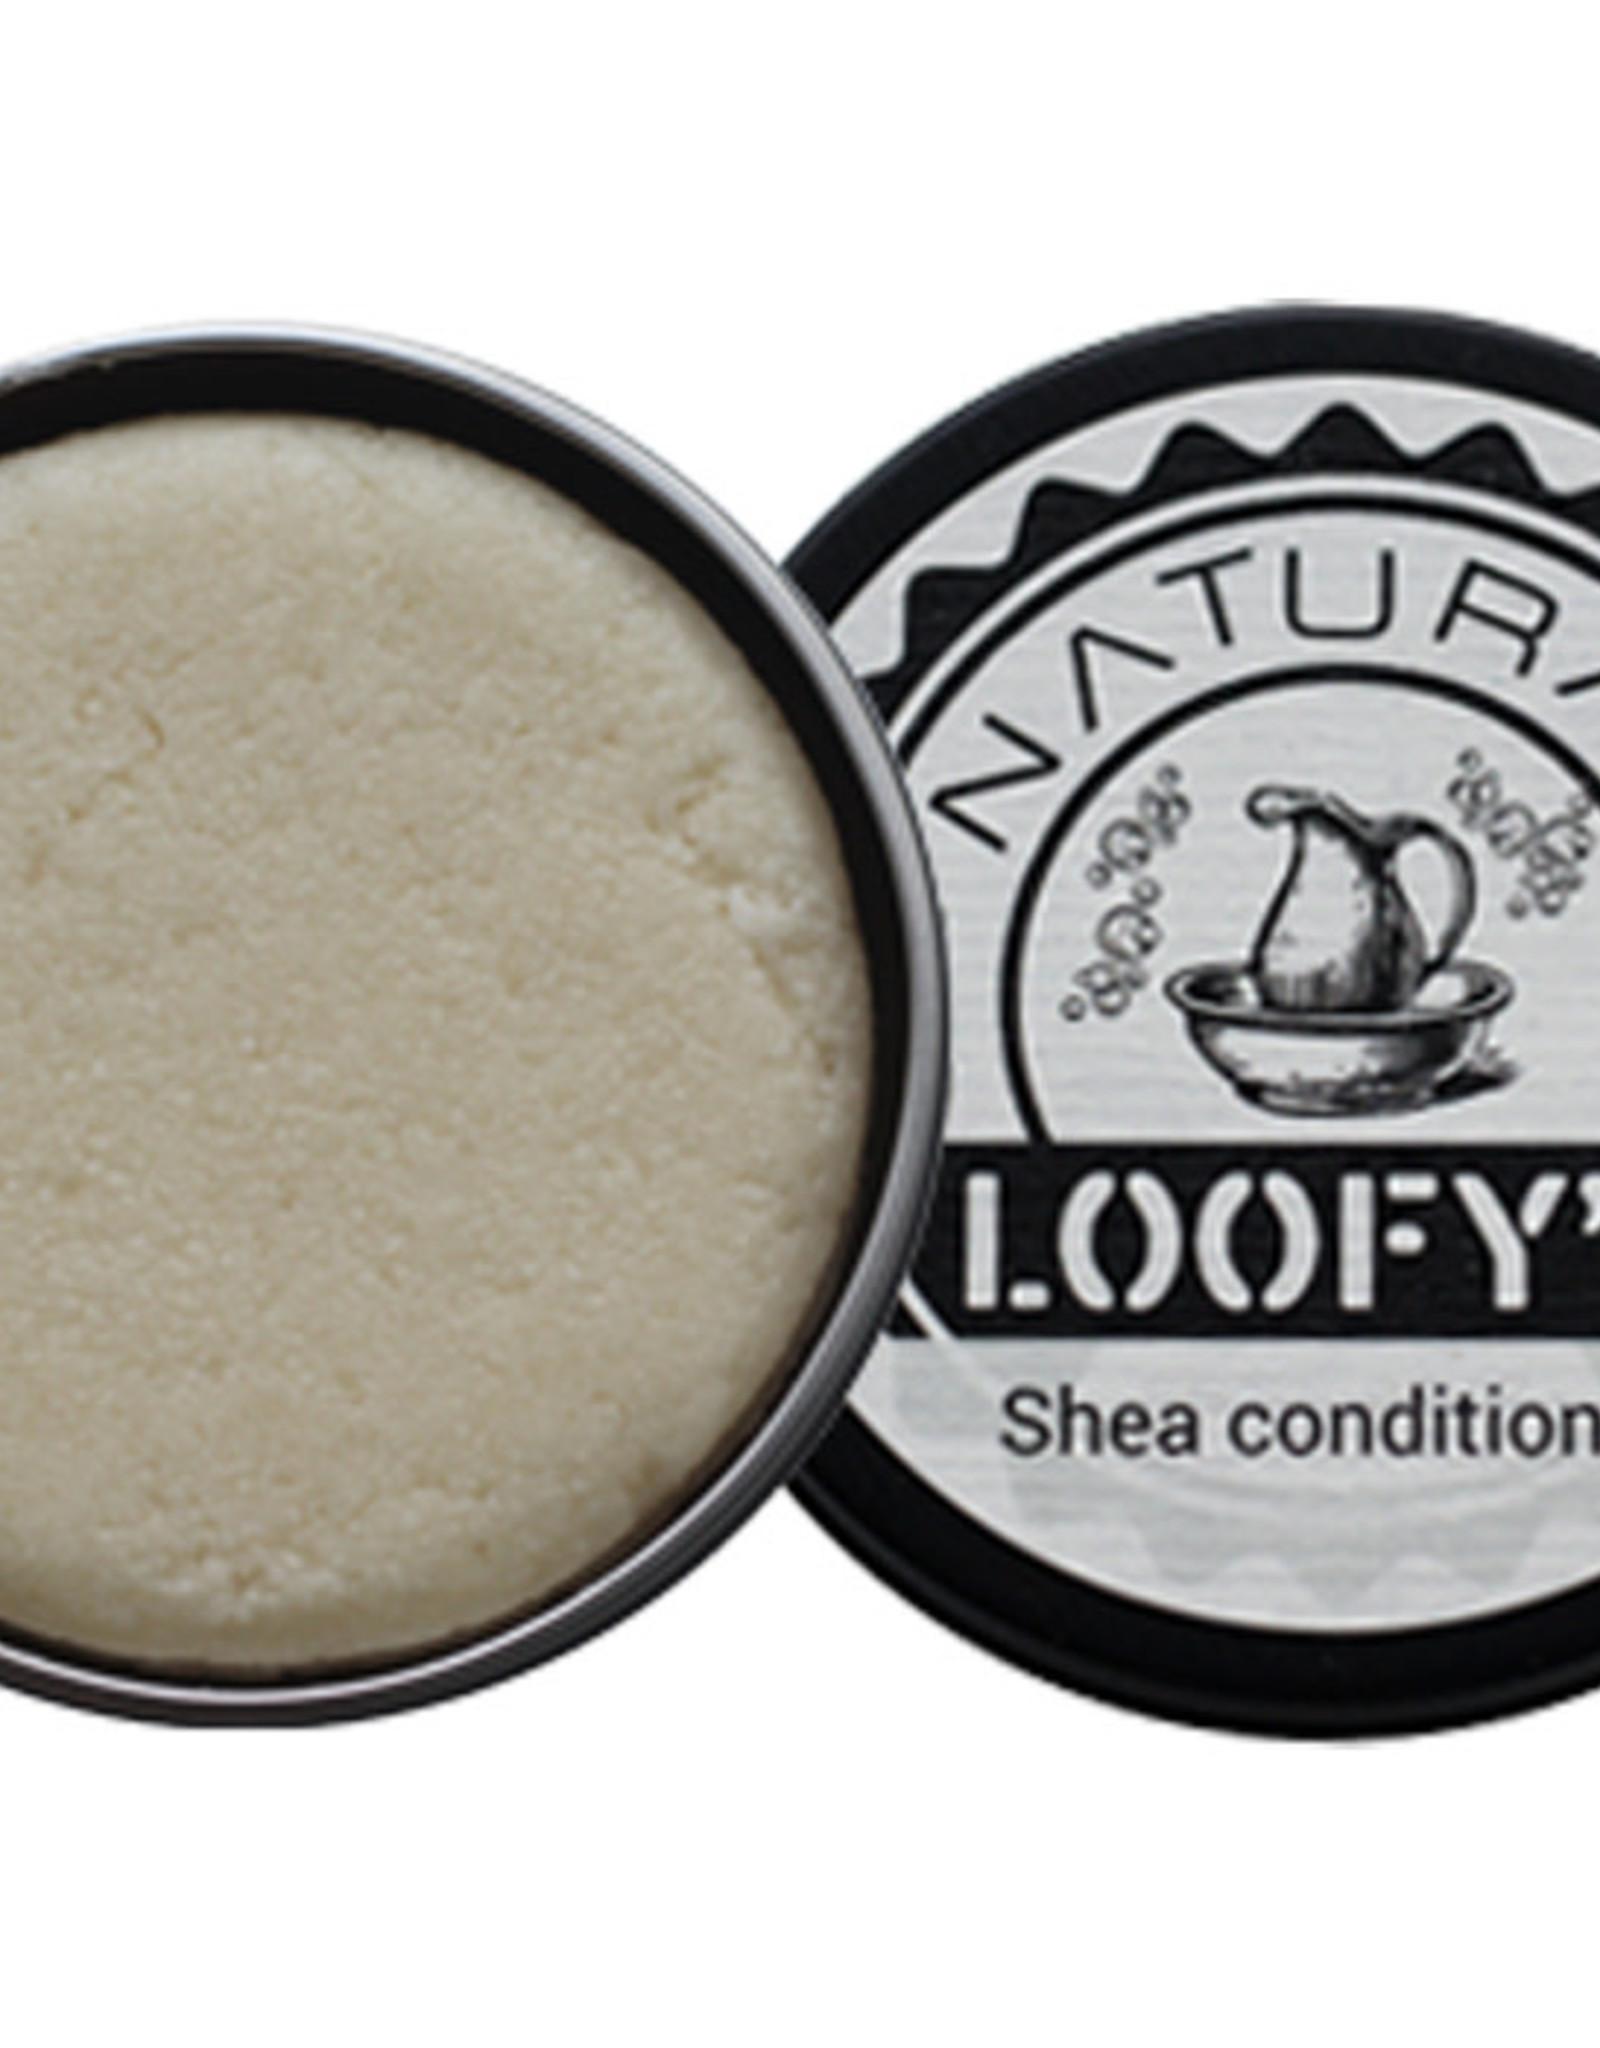 Loofys Loofys - Conditioner Bar Shea 70g